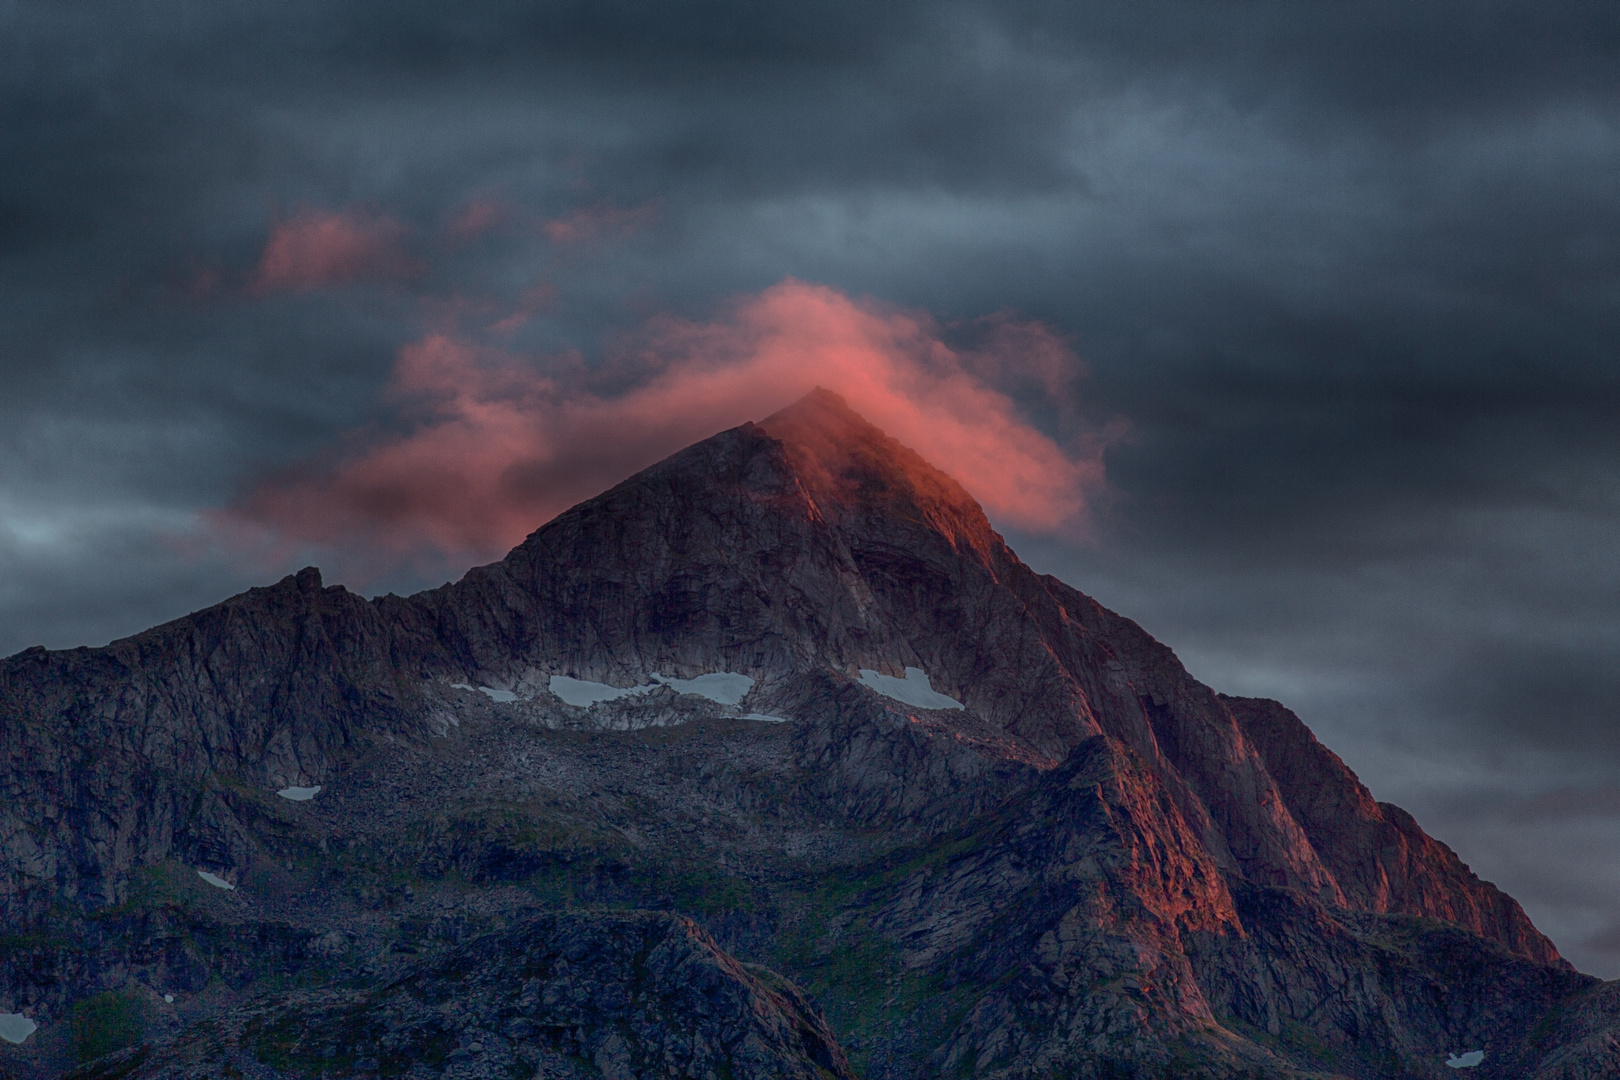 Berggipfel im Abendrot